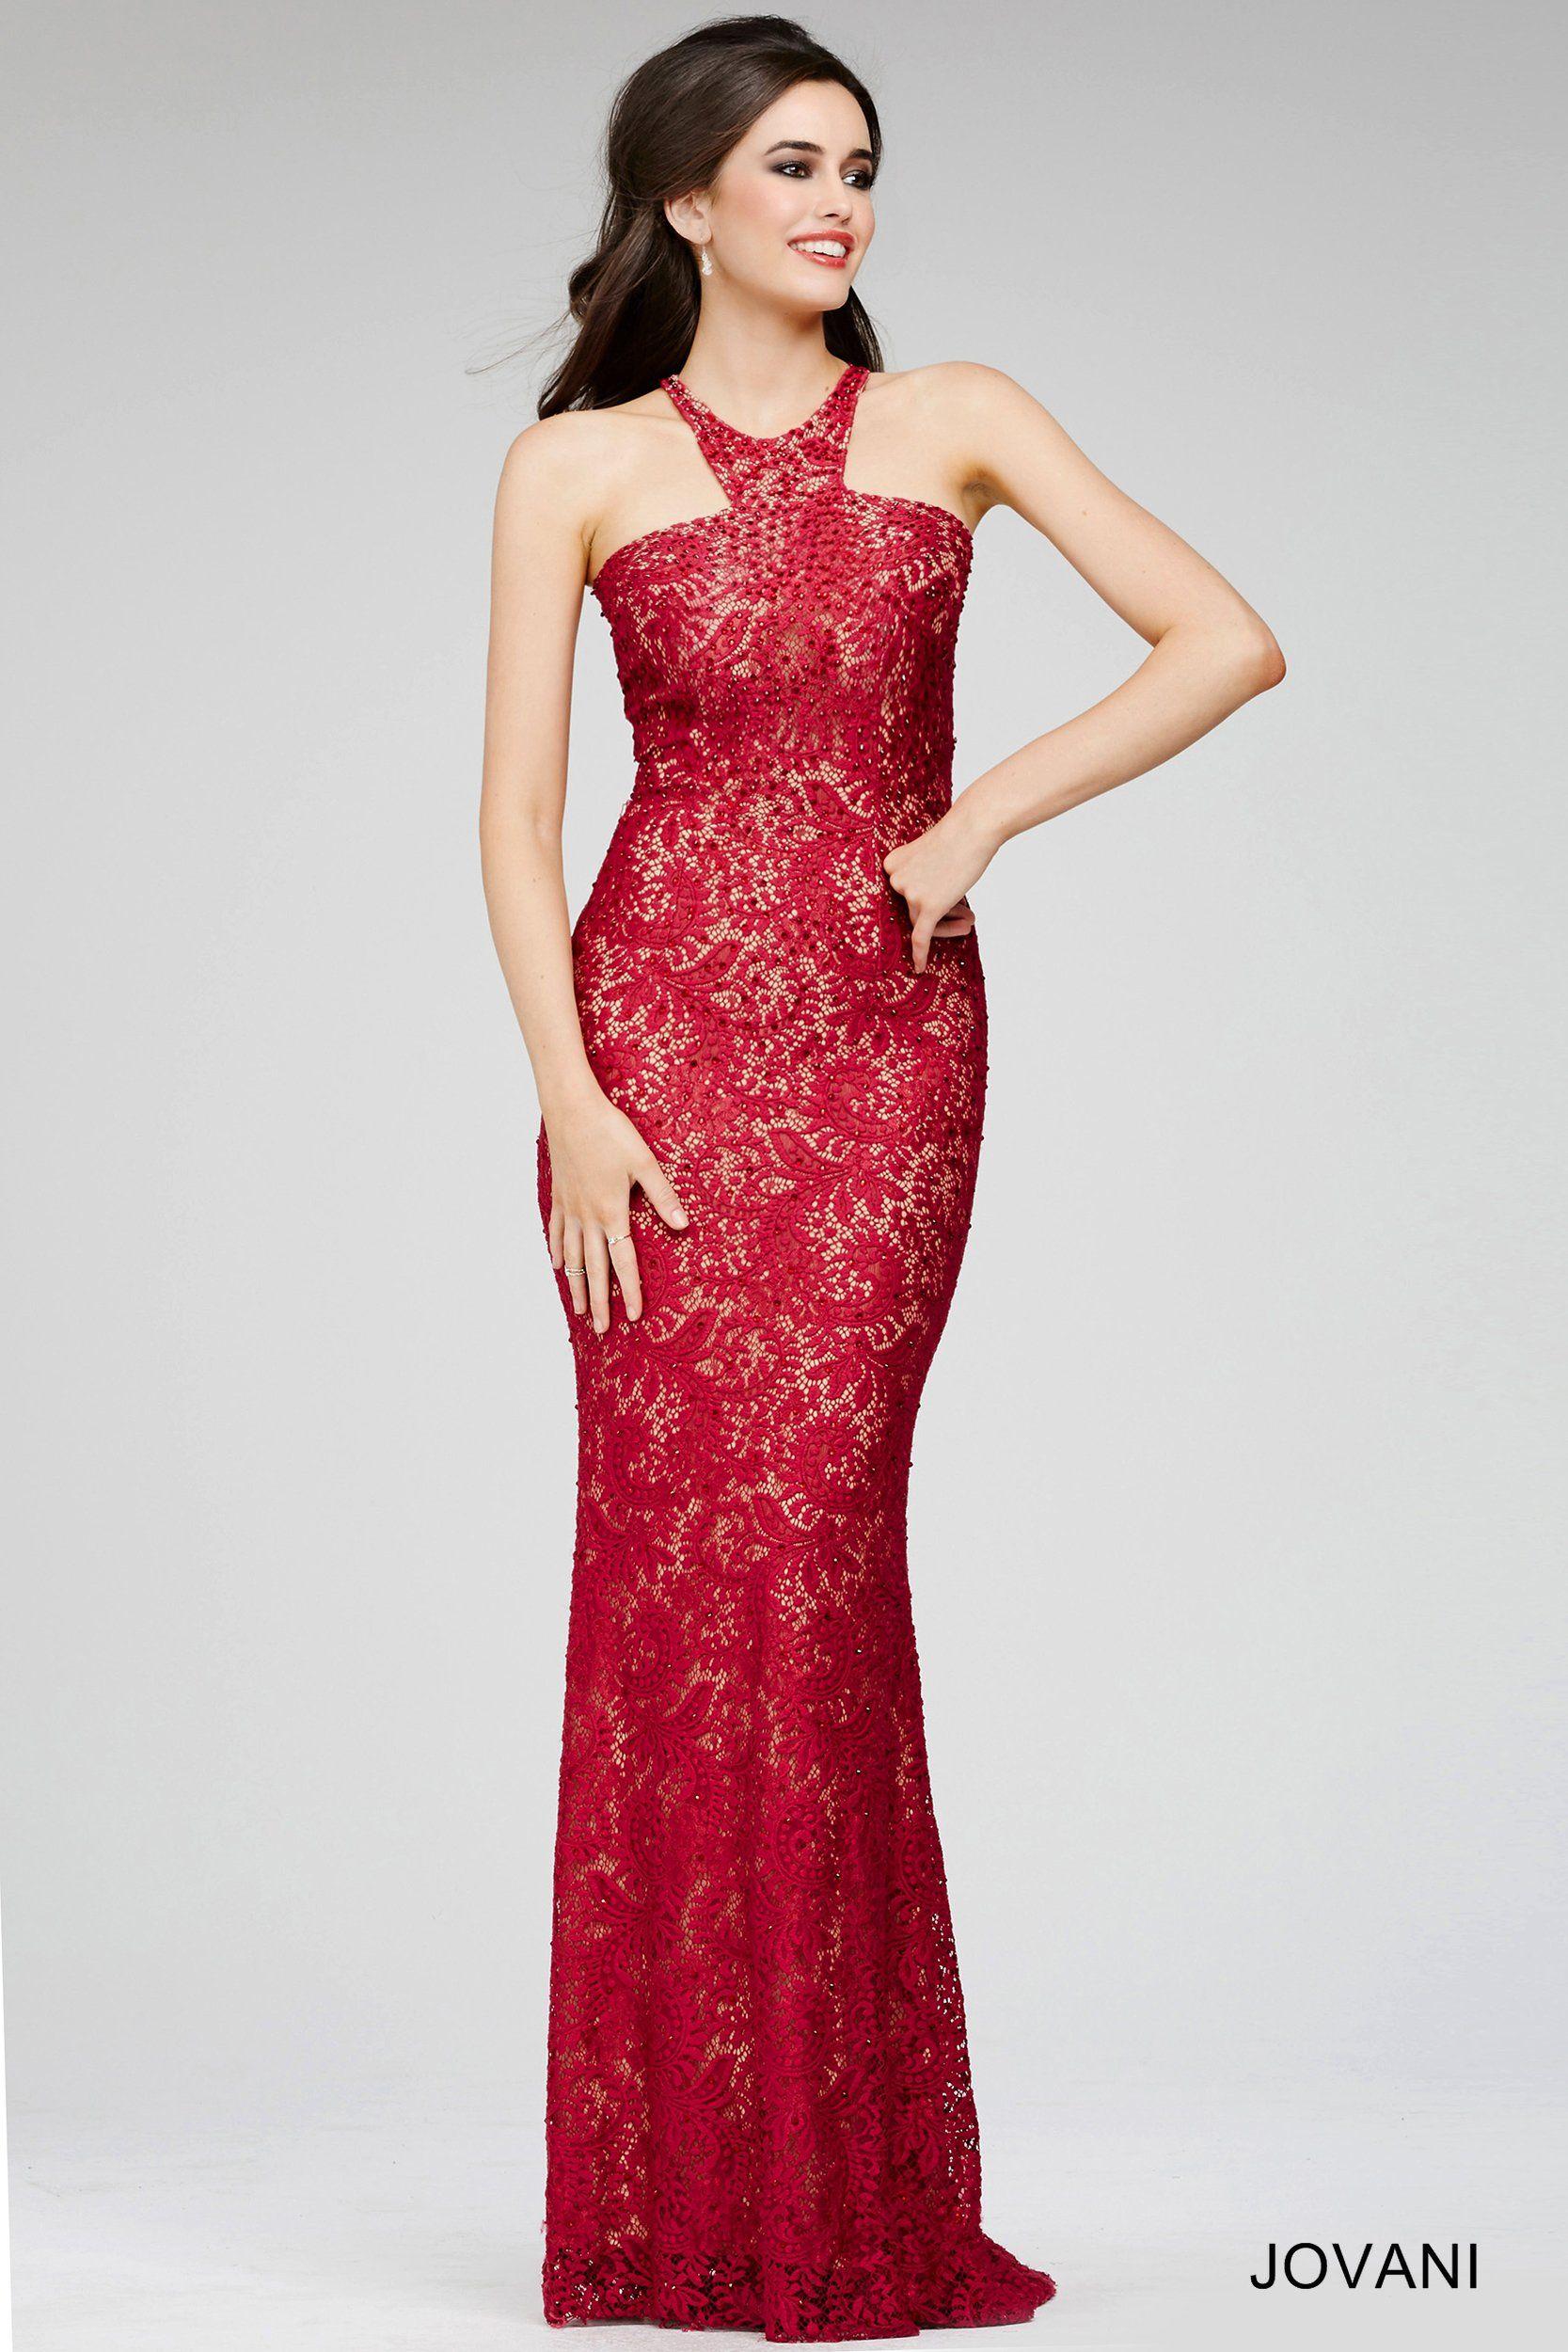 Red floral lace dress evening dresses pinterest floral